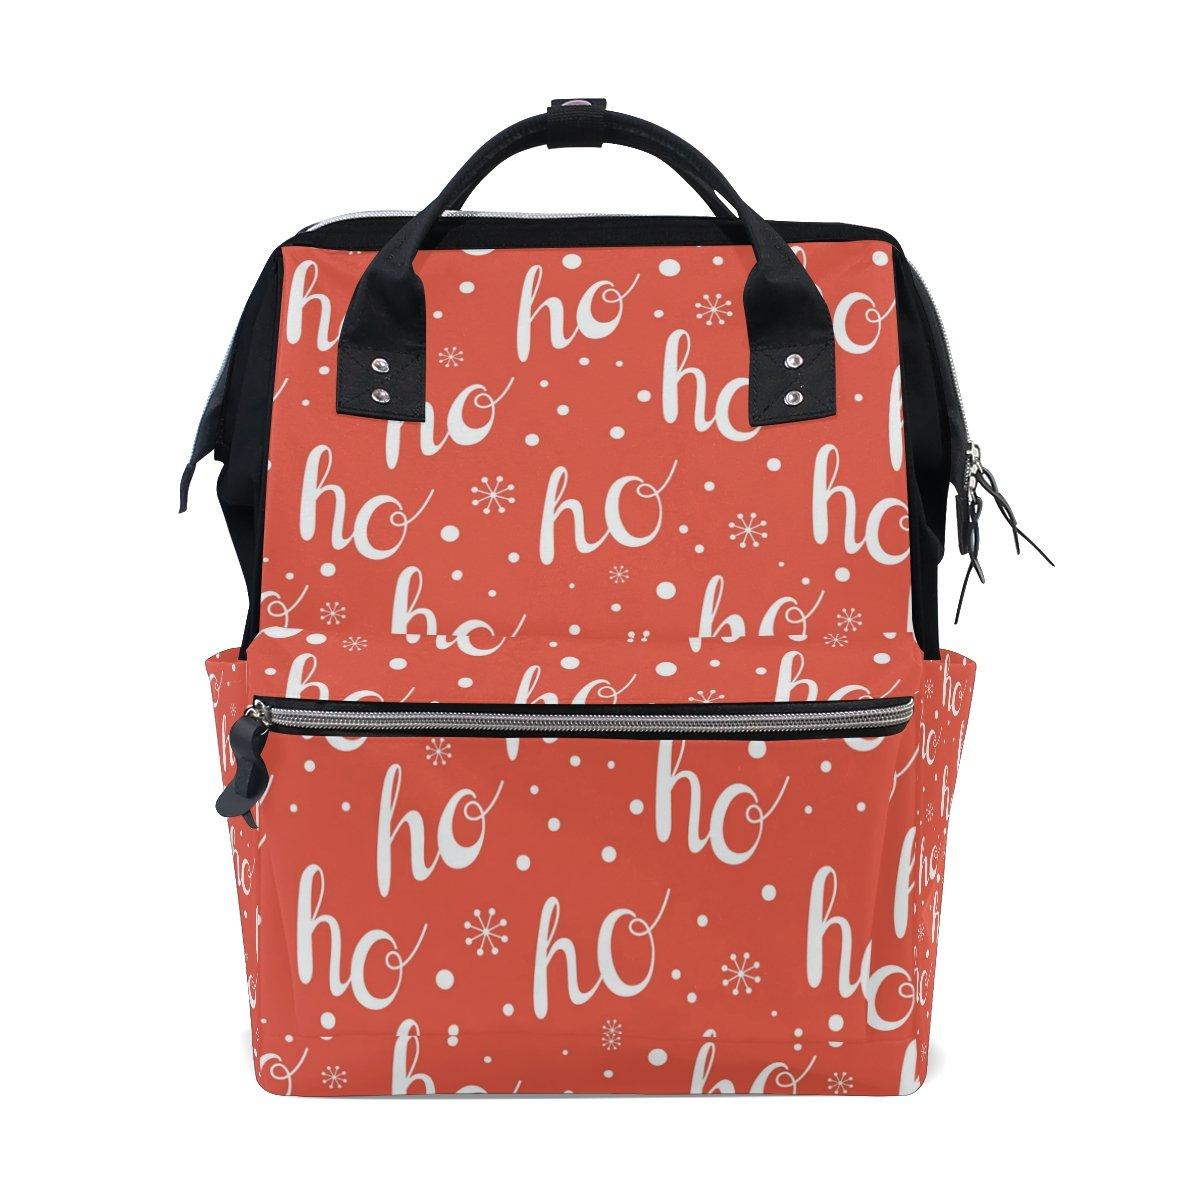 JSTeLノートパソコンカレッジバッグ学生旅行HoHoHo Winter Holidaysレッドandホワイト学校バックパックショルダートートバッグ   B078MRDL1J